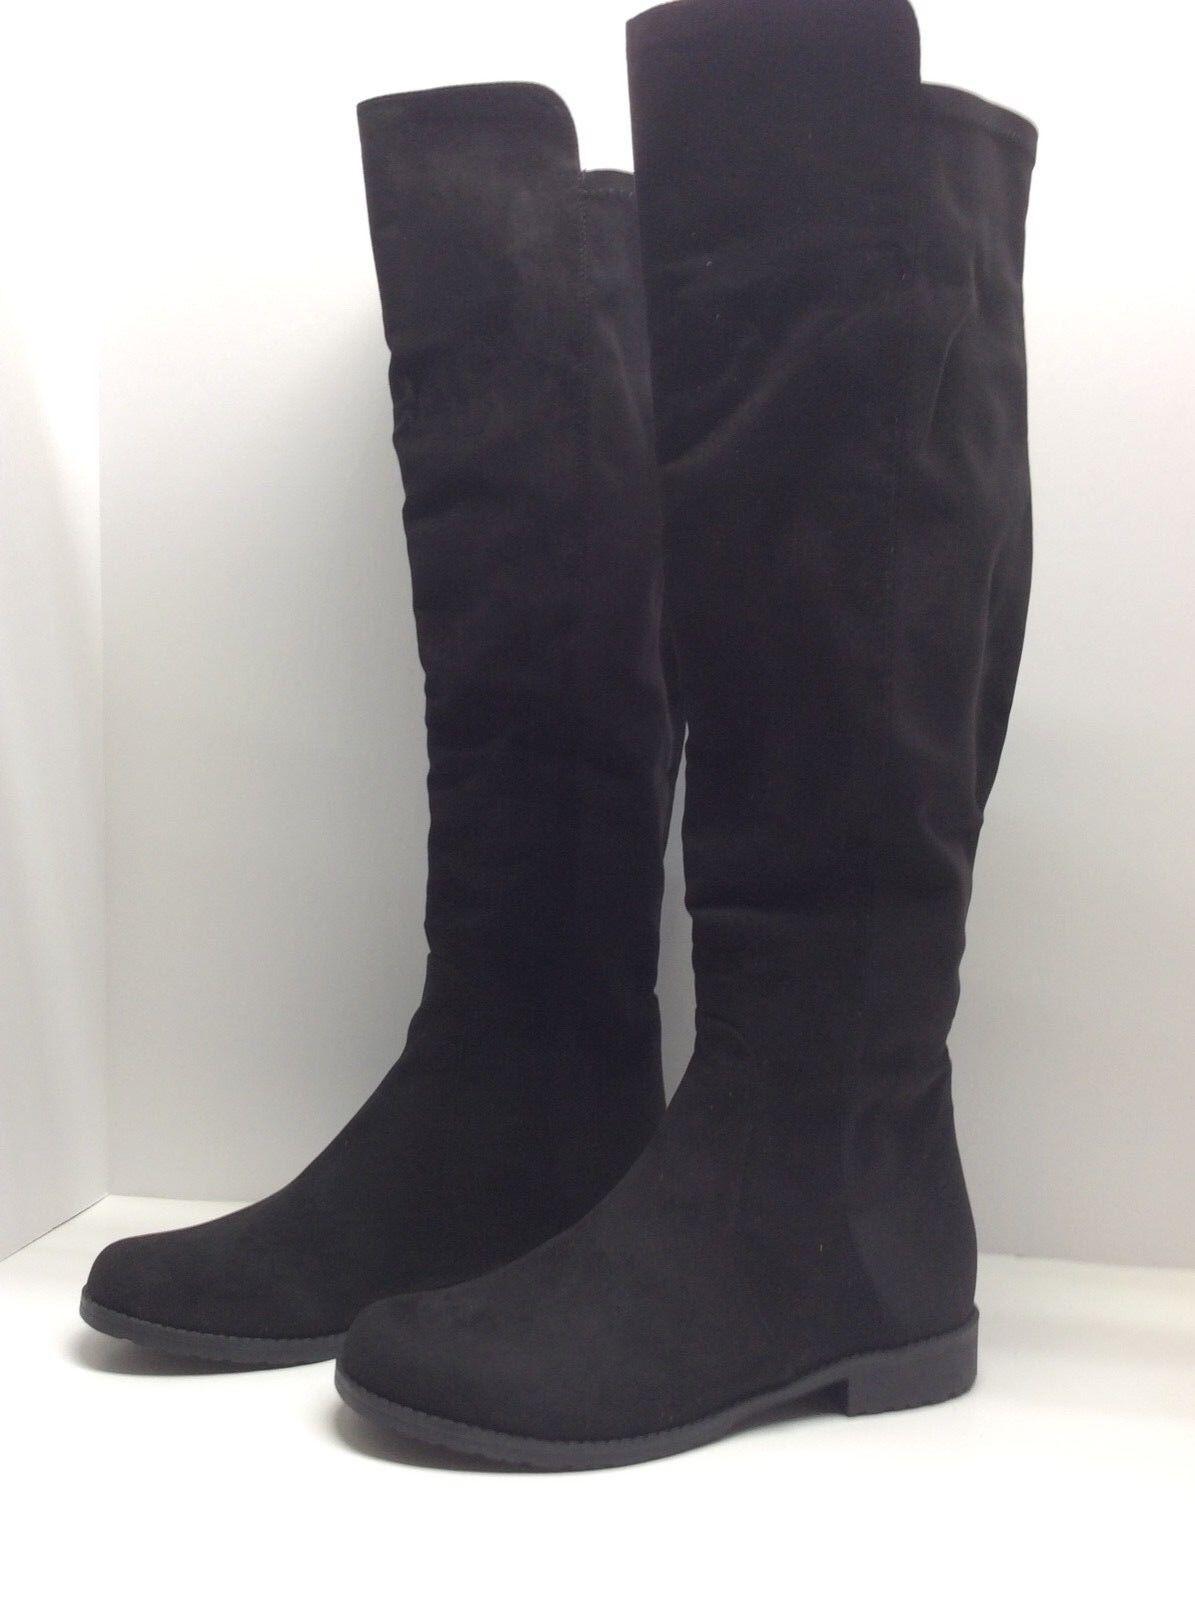 UNISA Gillean     Negro sobre la rodilla botas talla 6.5M  79-2 Stretch  alta calidad